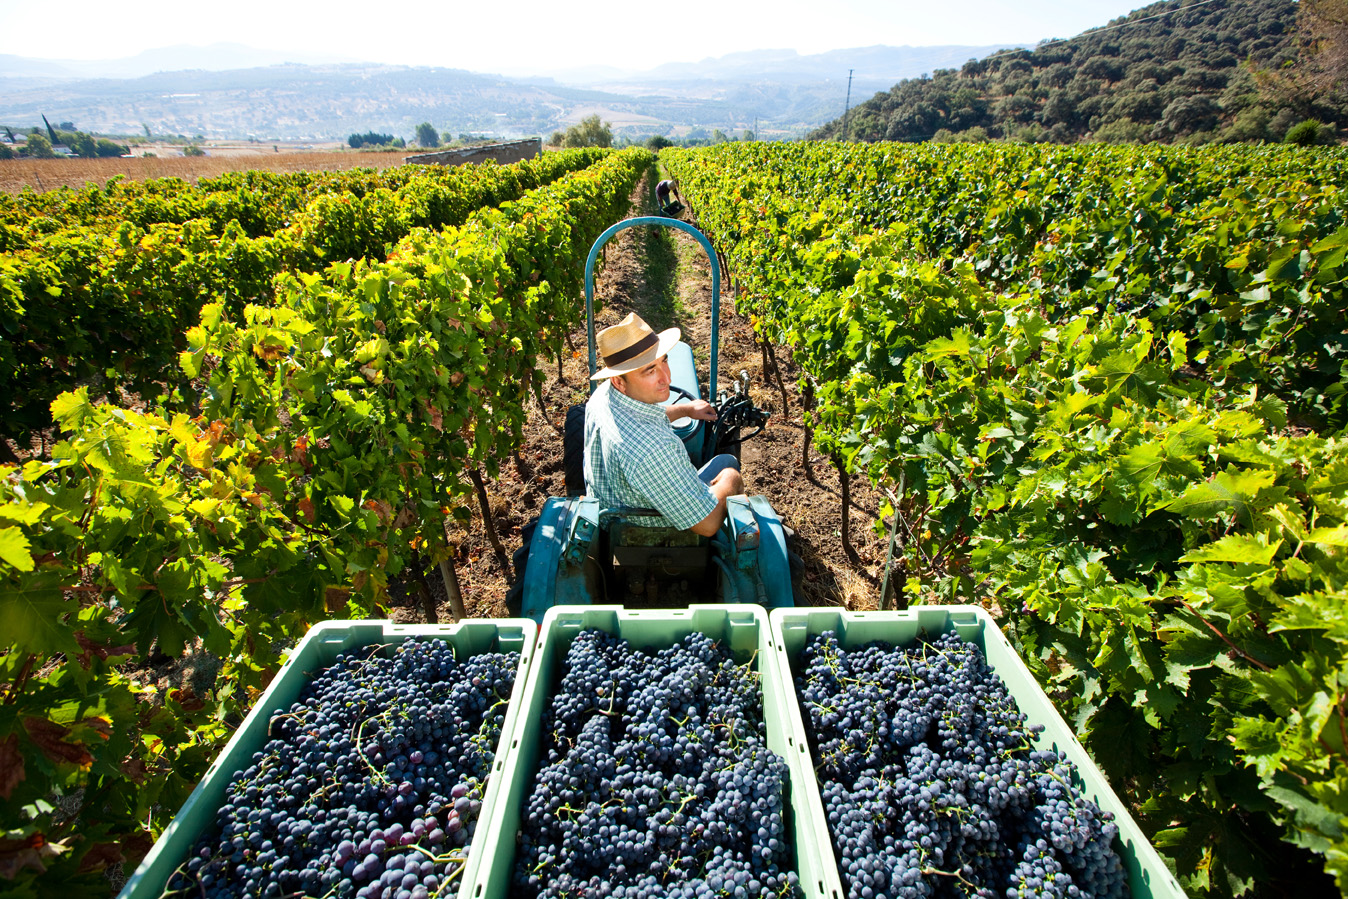 Bodega F. Schatz harvesting process at vineyard in Spain